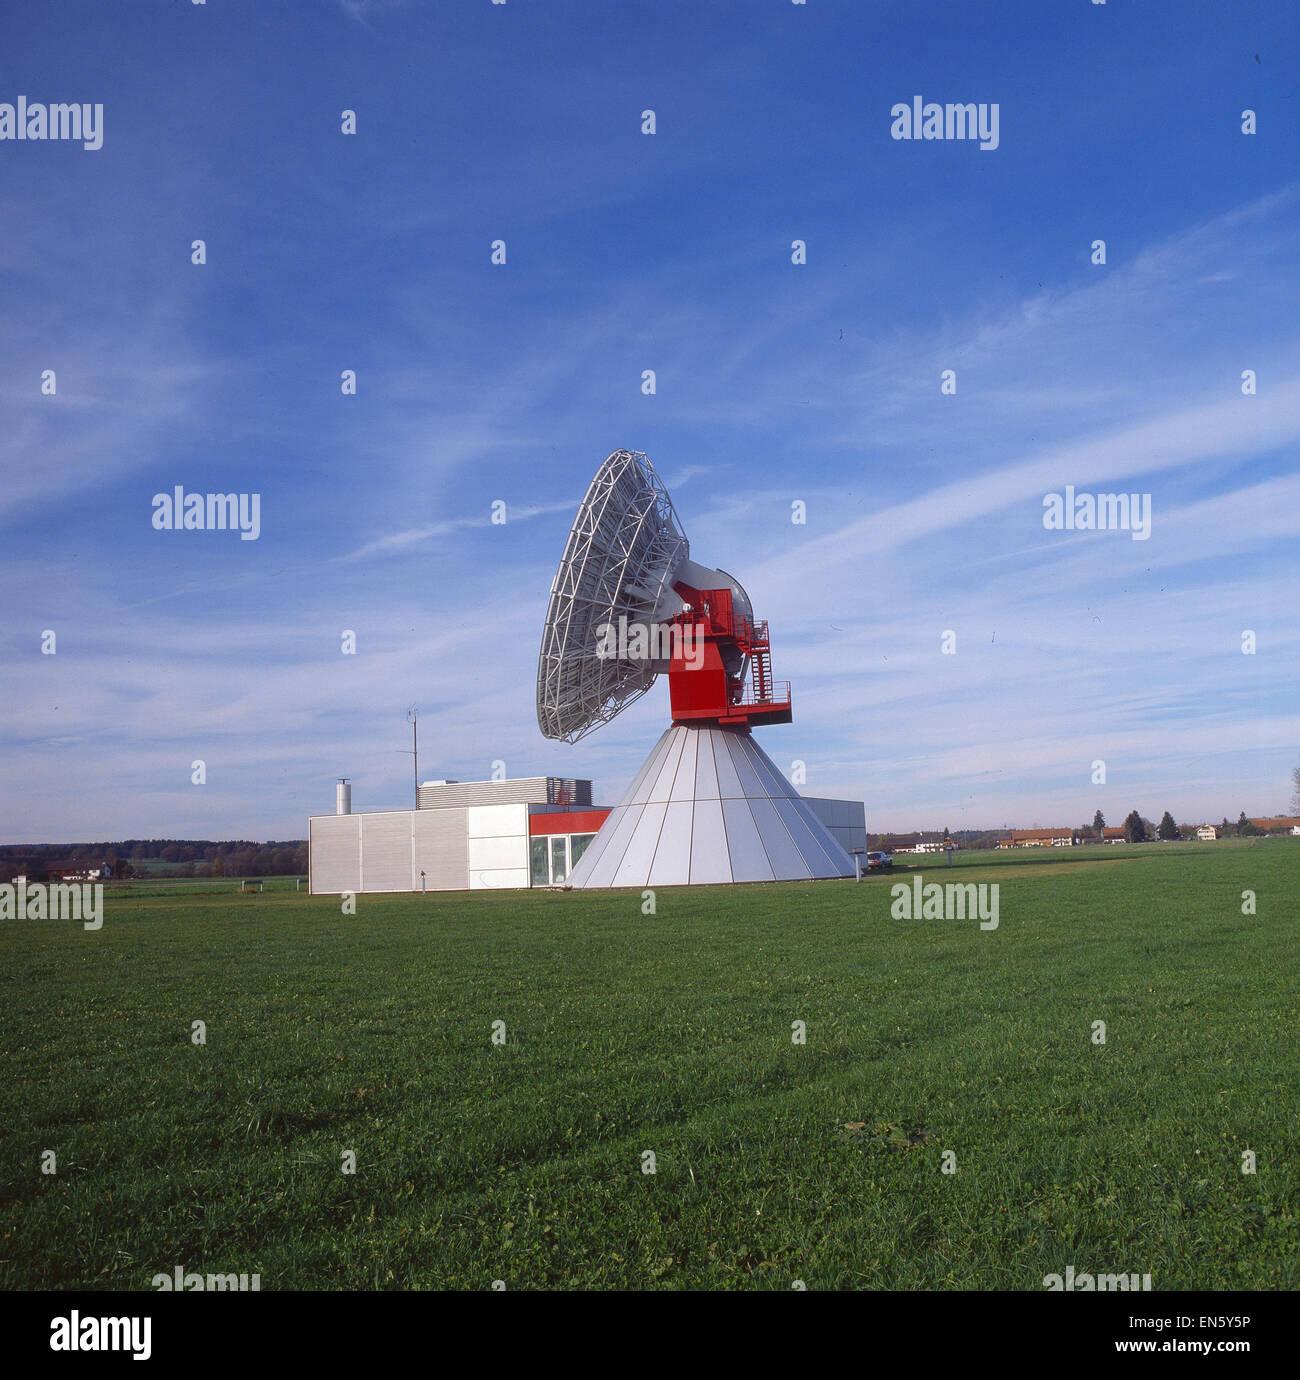 Duitsland, Rainsting, Satellietschotel, Veld - Stock Image